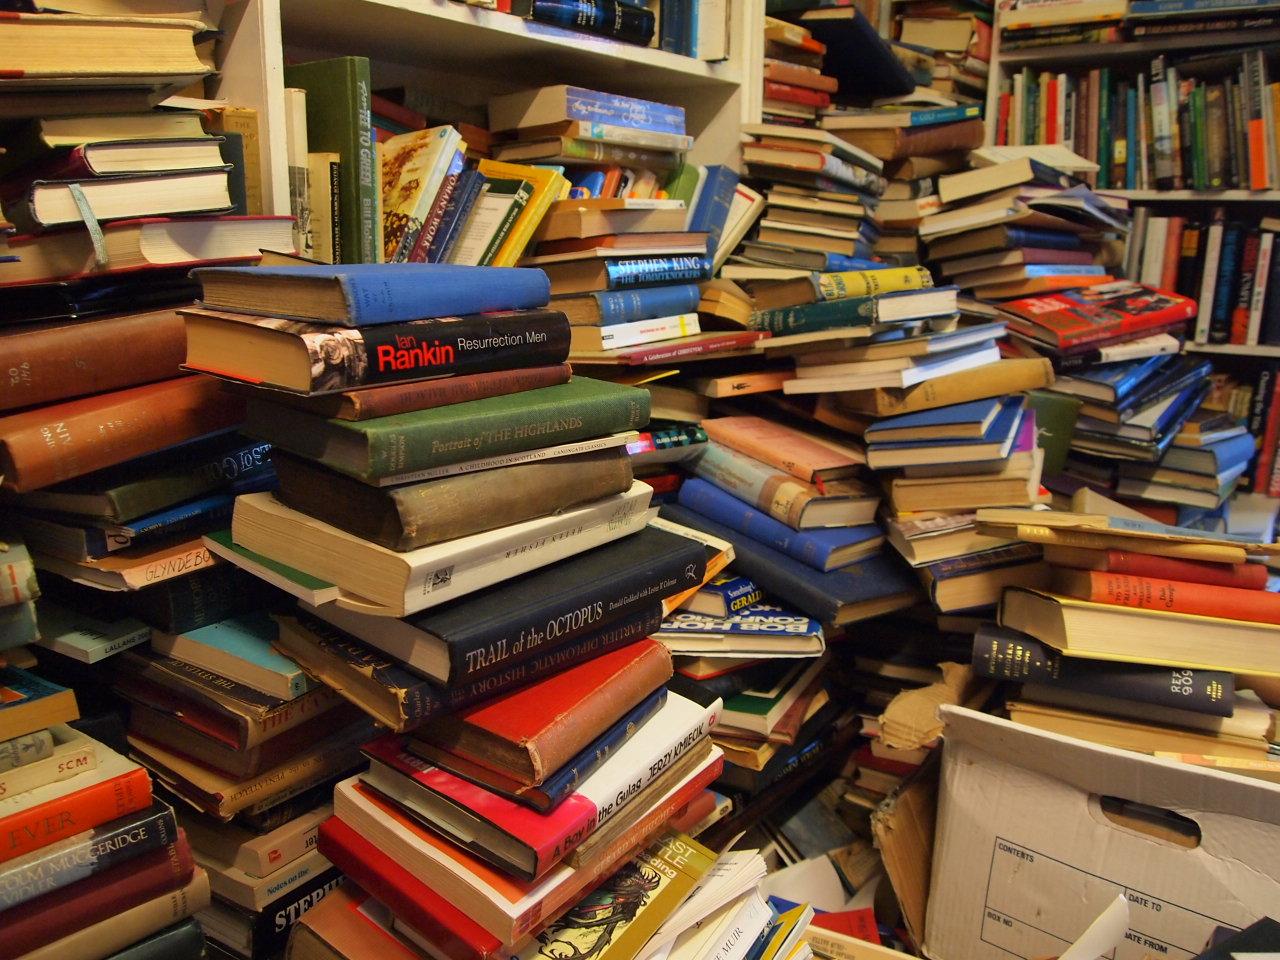 rousseau voltaire piles boxes club upon flickr nightmare minimalist shelves worst heaven idea